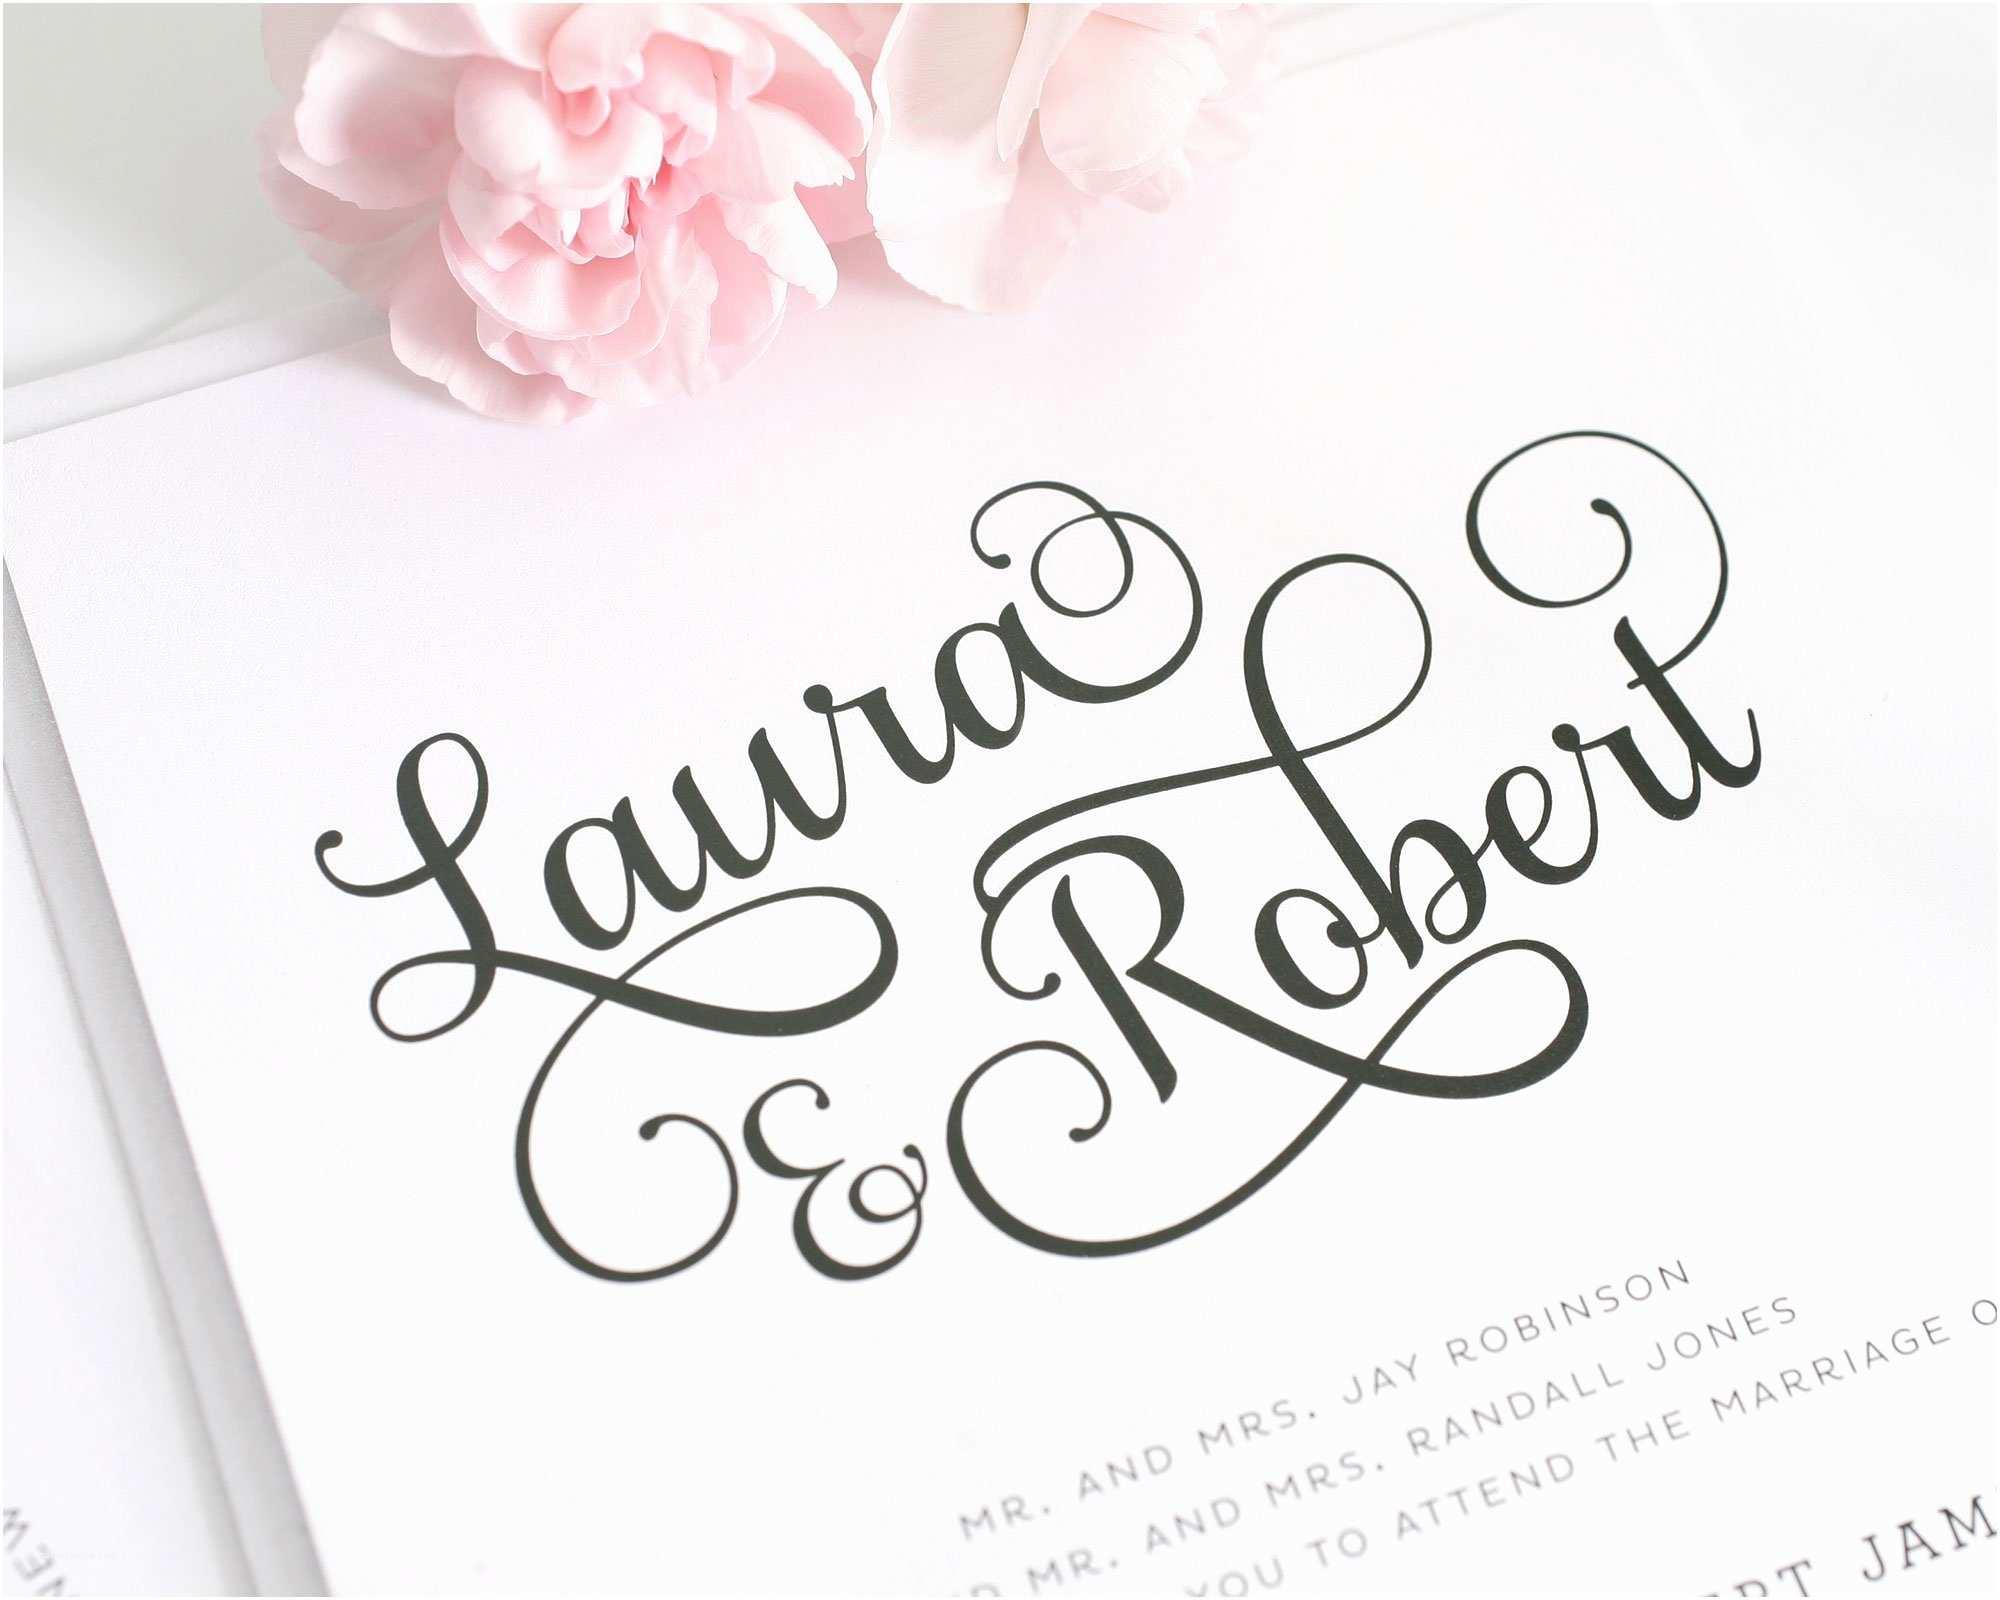 Romantic Wedding Invitations Wording Examples Sweet and Romantic Wedding Invitations with Script